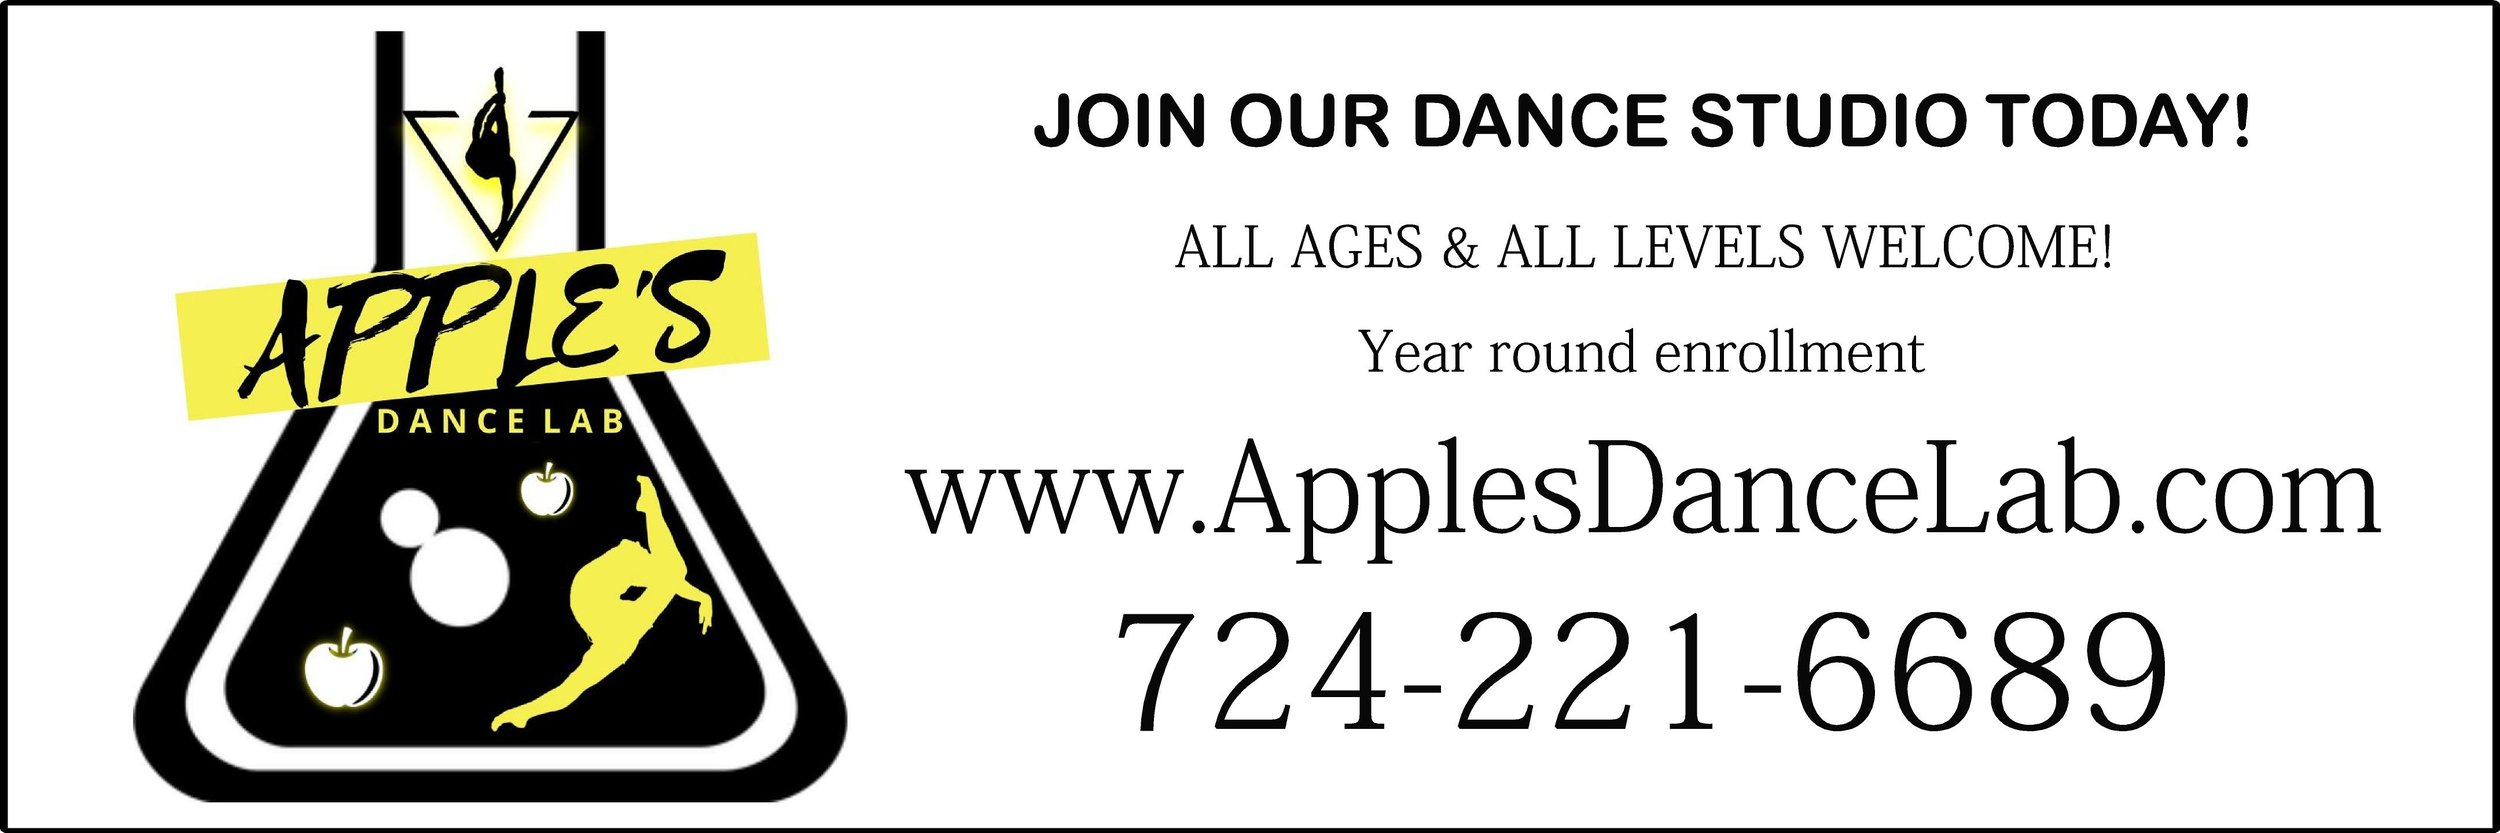 apples dance lab.jpg